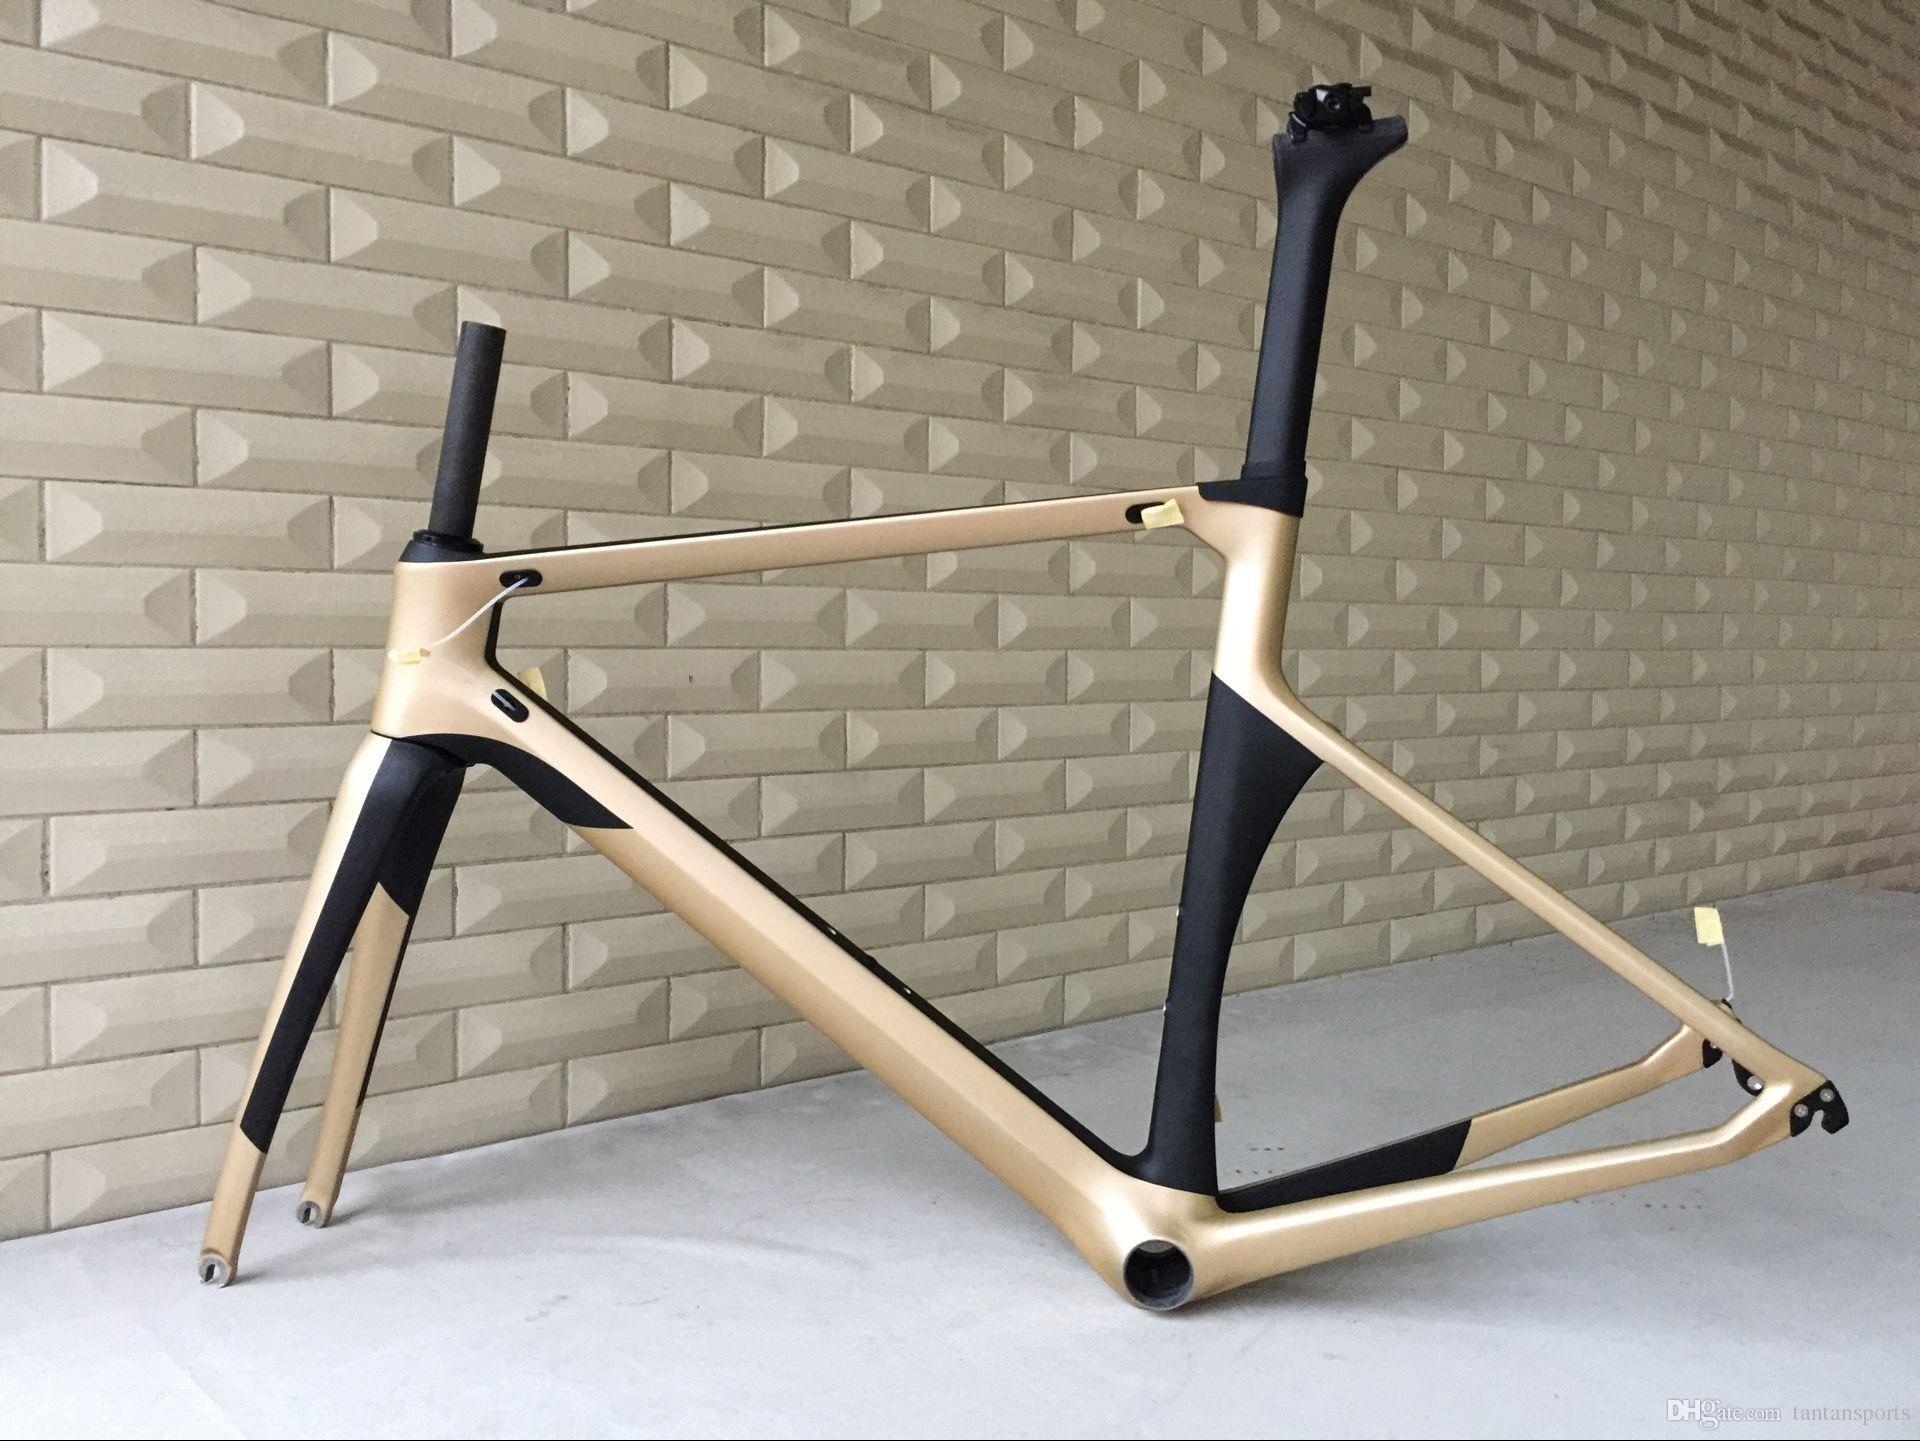 chinese-di2-carbon-road-bike-frame-bb86-aero.jpg (JPEG Image, 1920 × 1441 pixels)